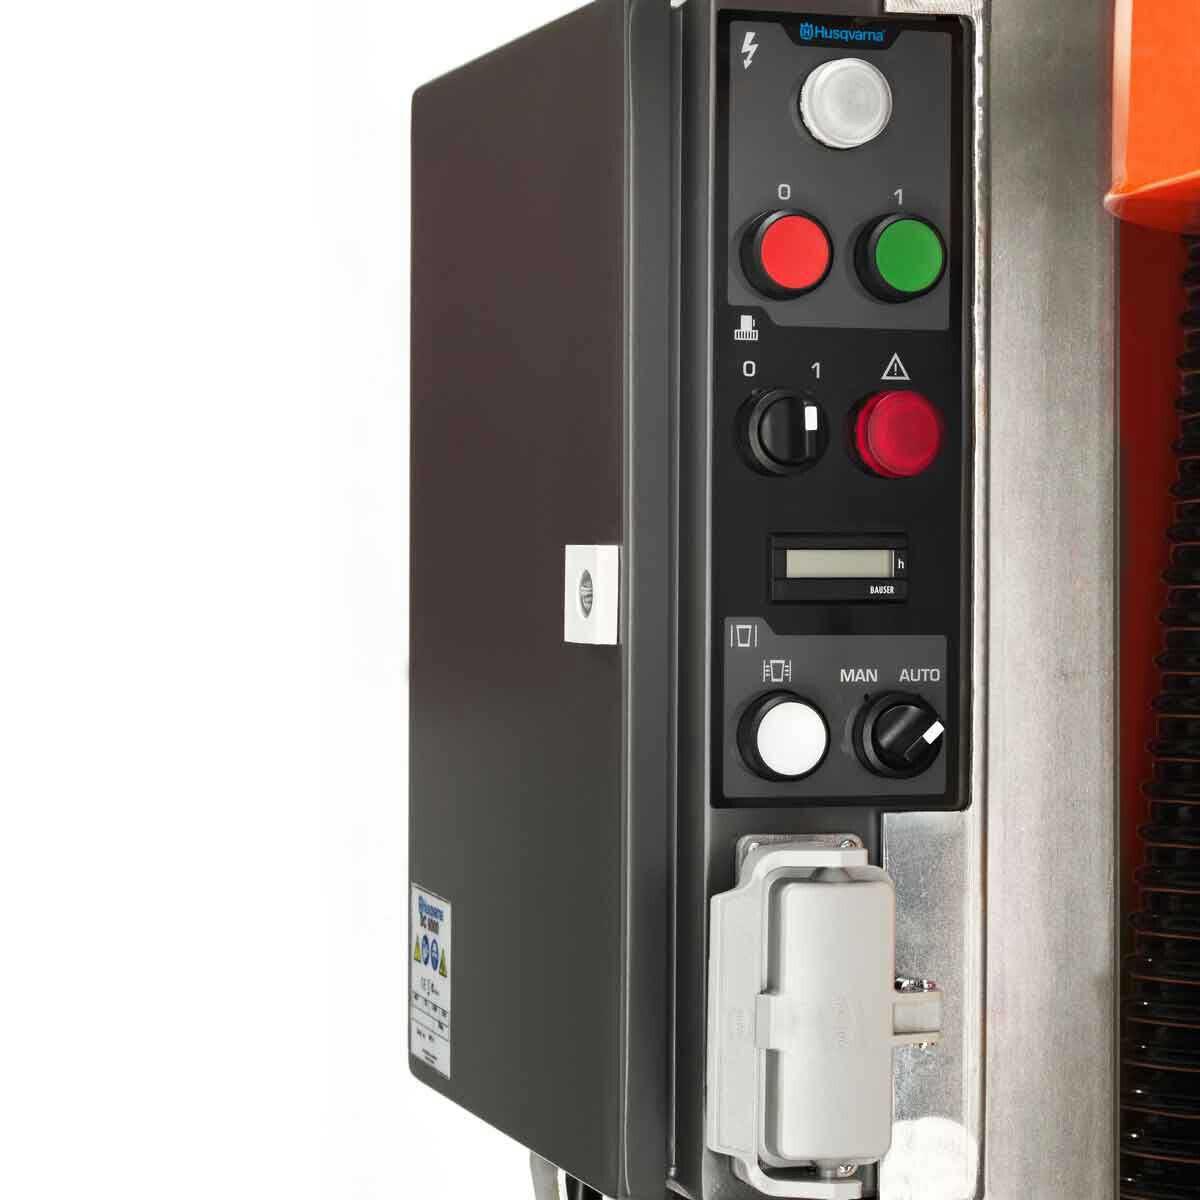 Husqvarna DC6000 Control Panel